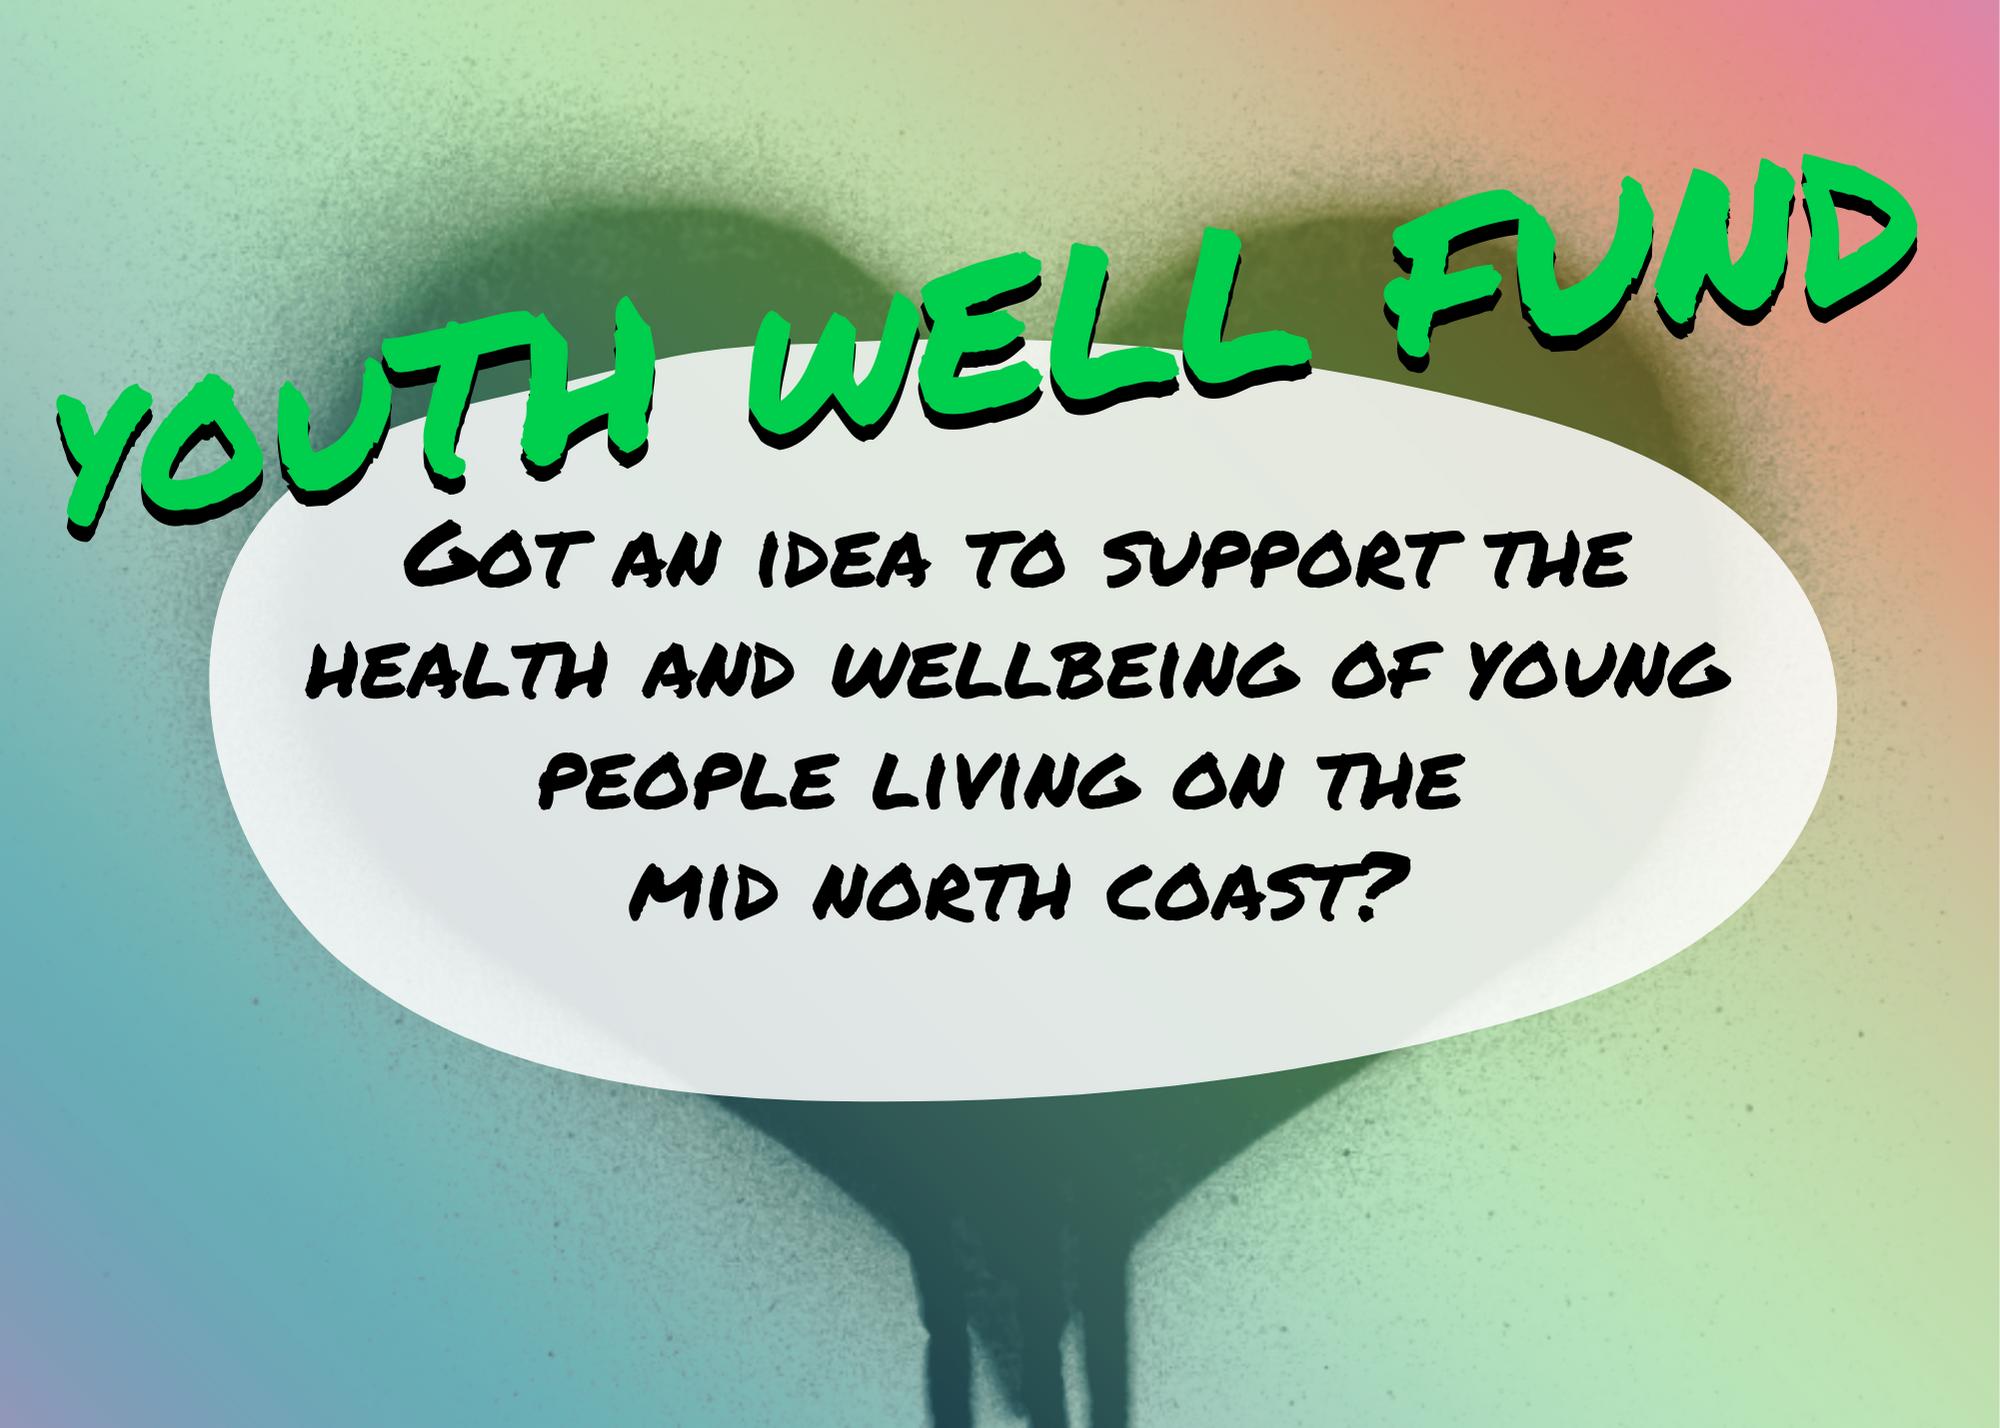 Youth Well Fund - got an idea?